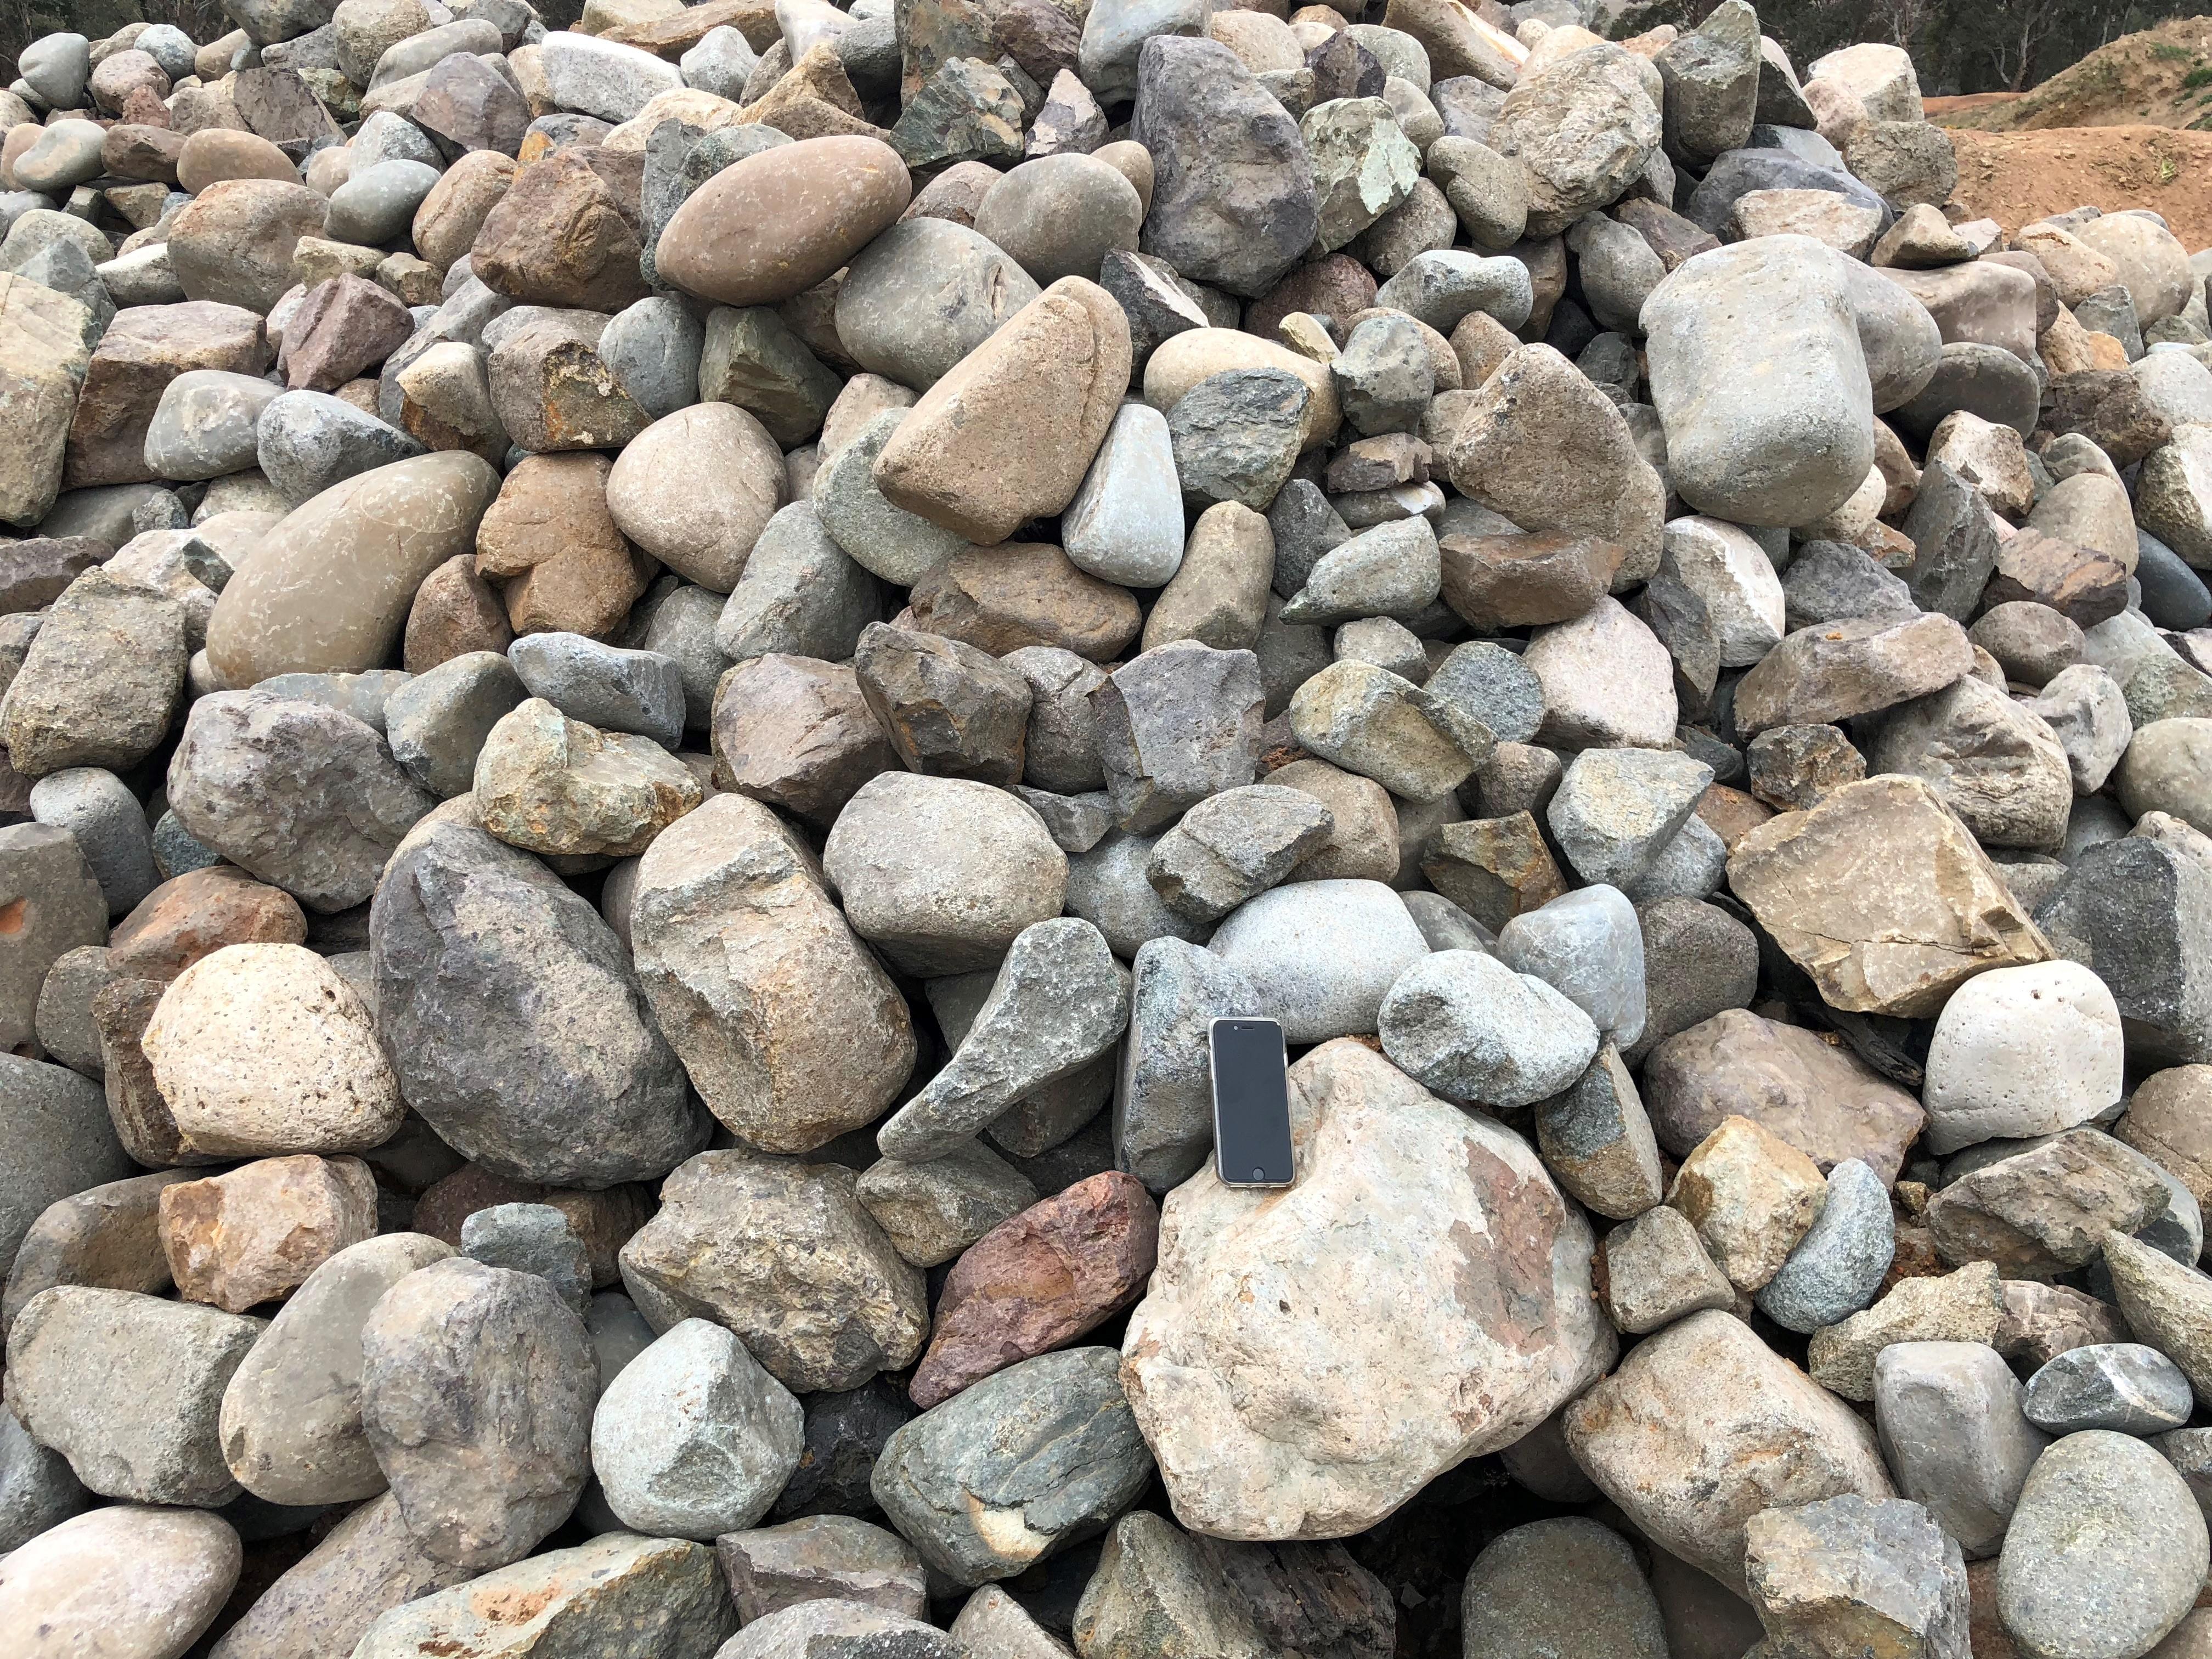 Tharwa Sands Ornamental River Stone #2